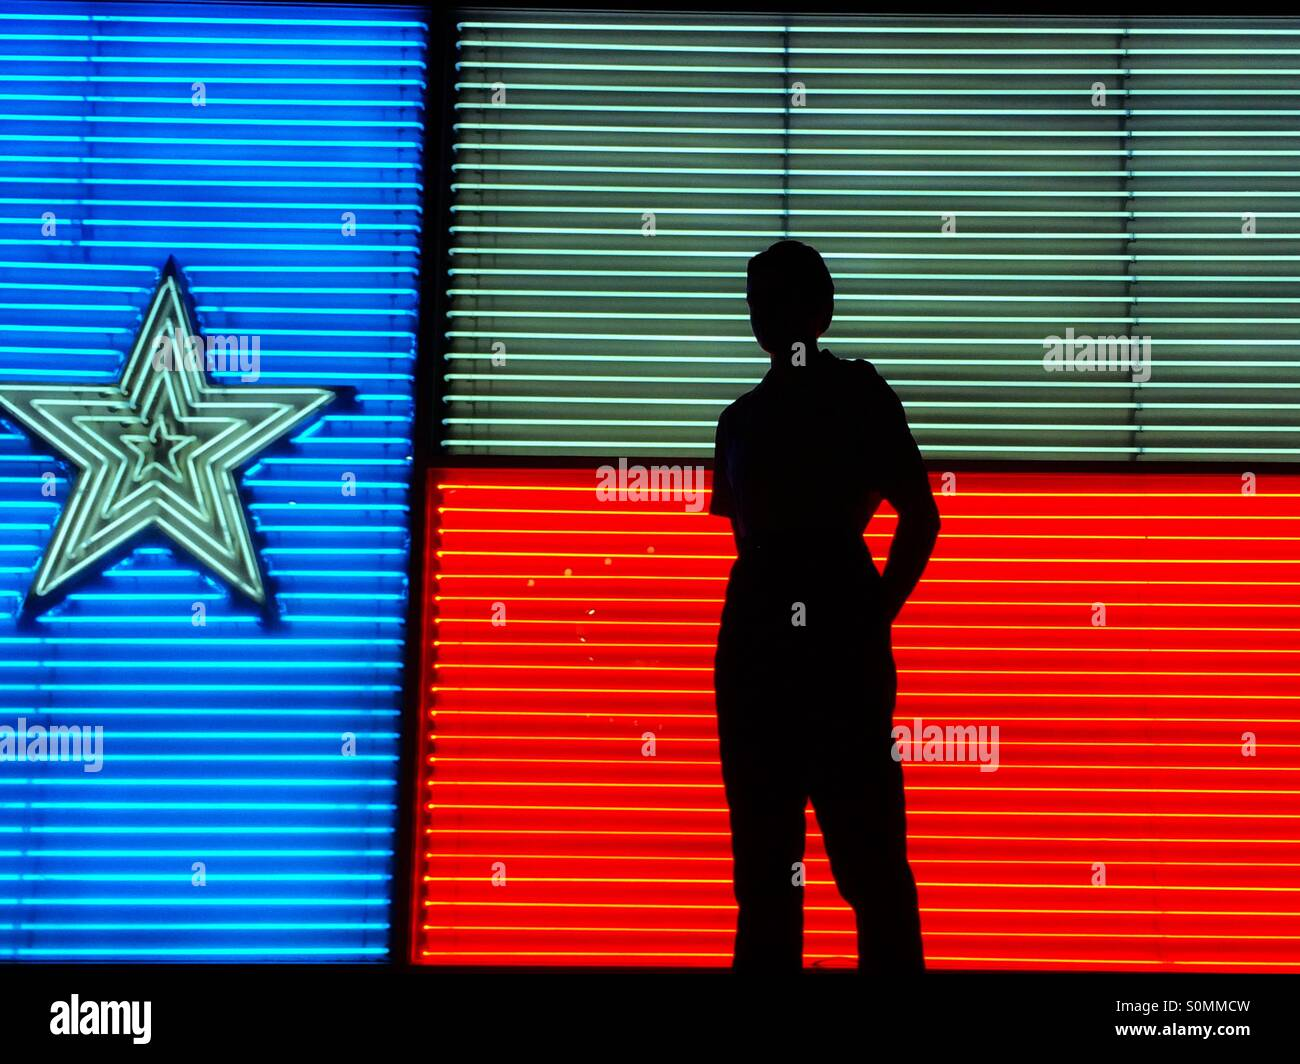 Texas Texan Flag Stockfotos & Texas Texan Flag Bilder - Alamy